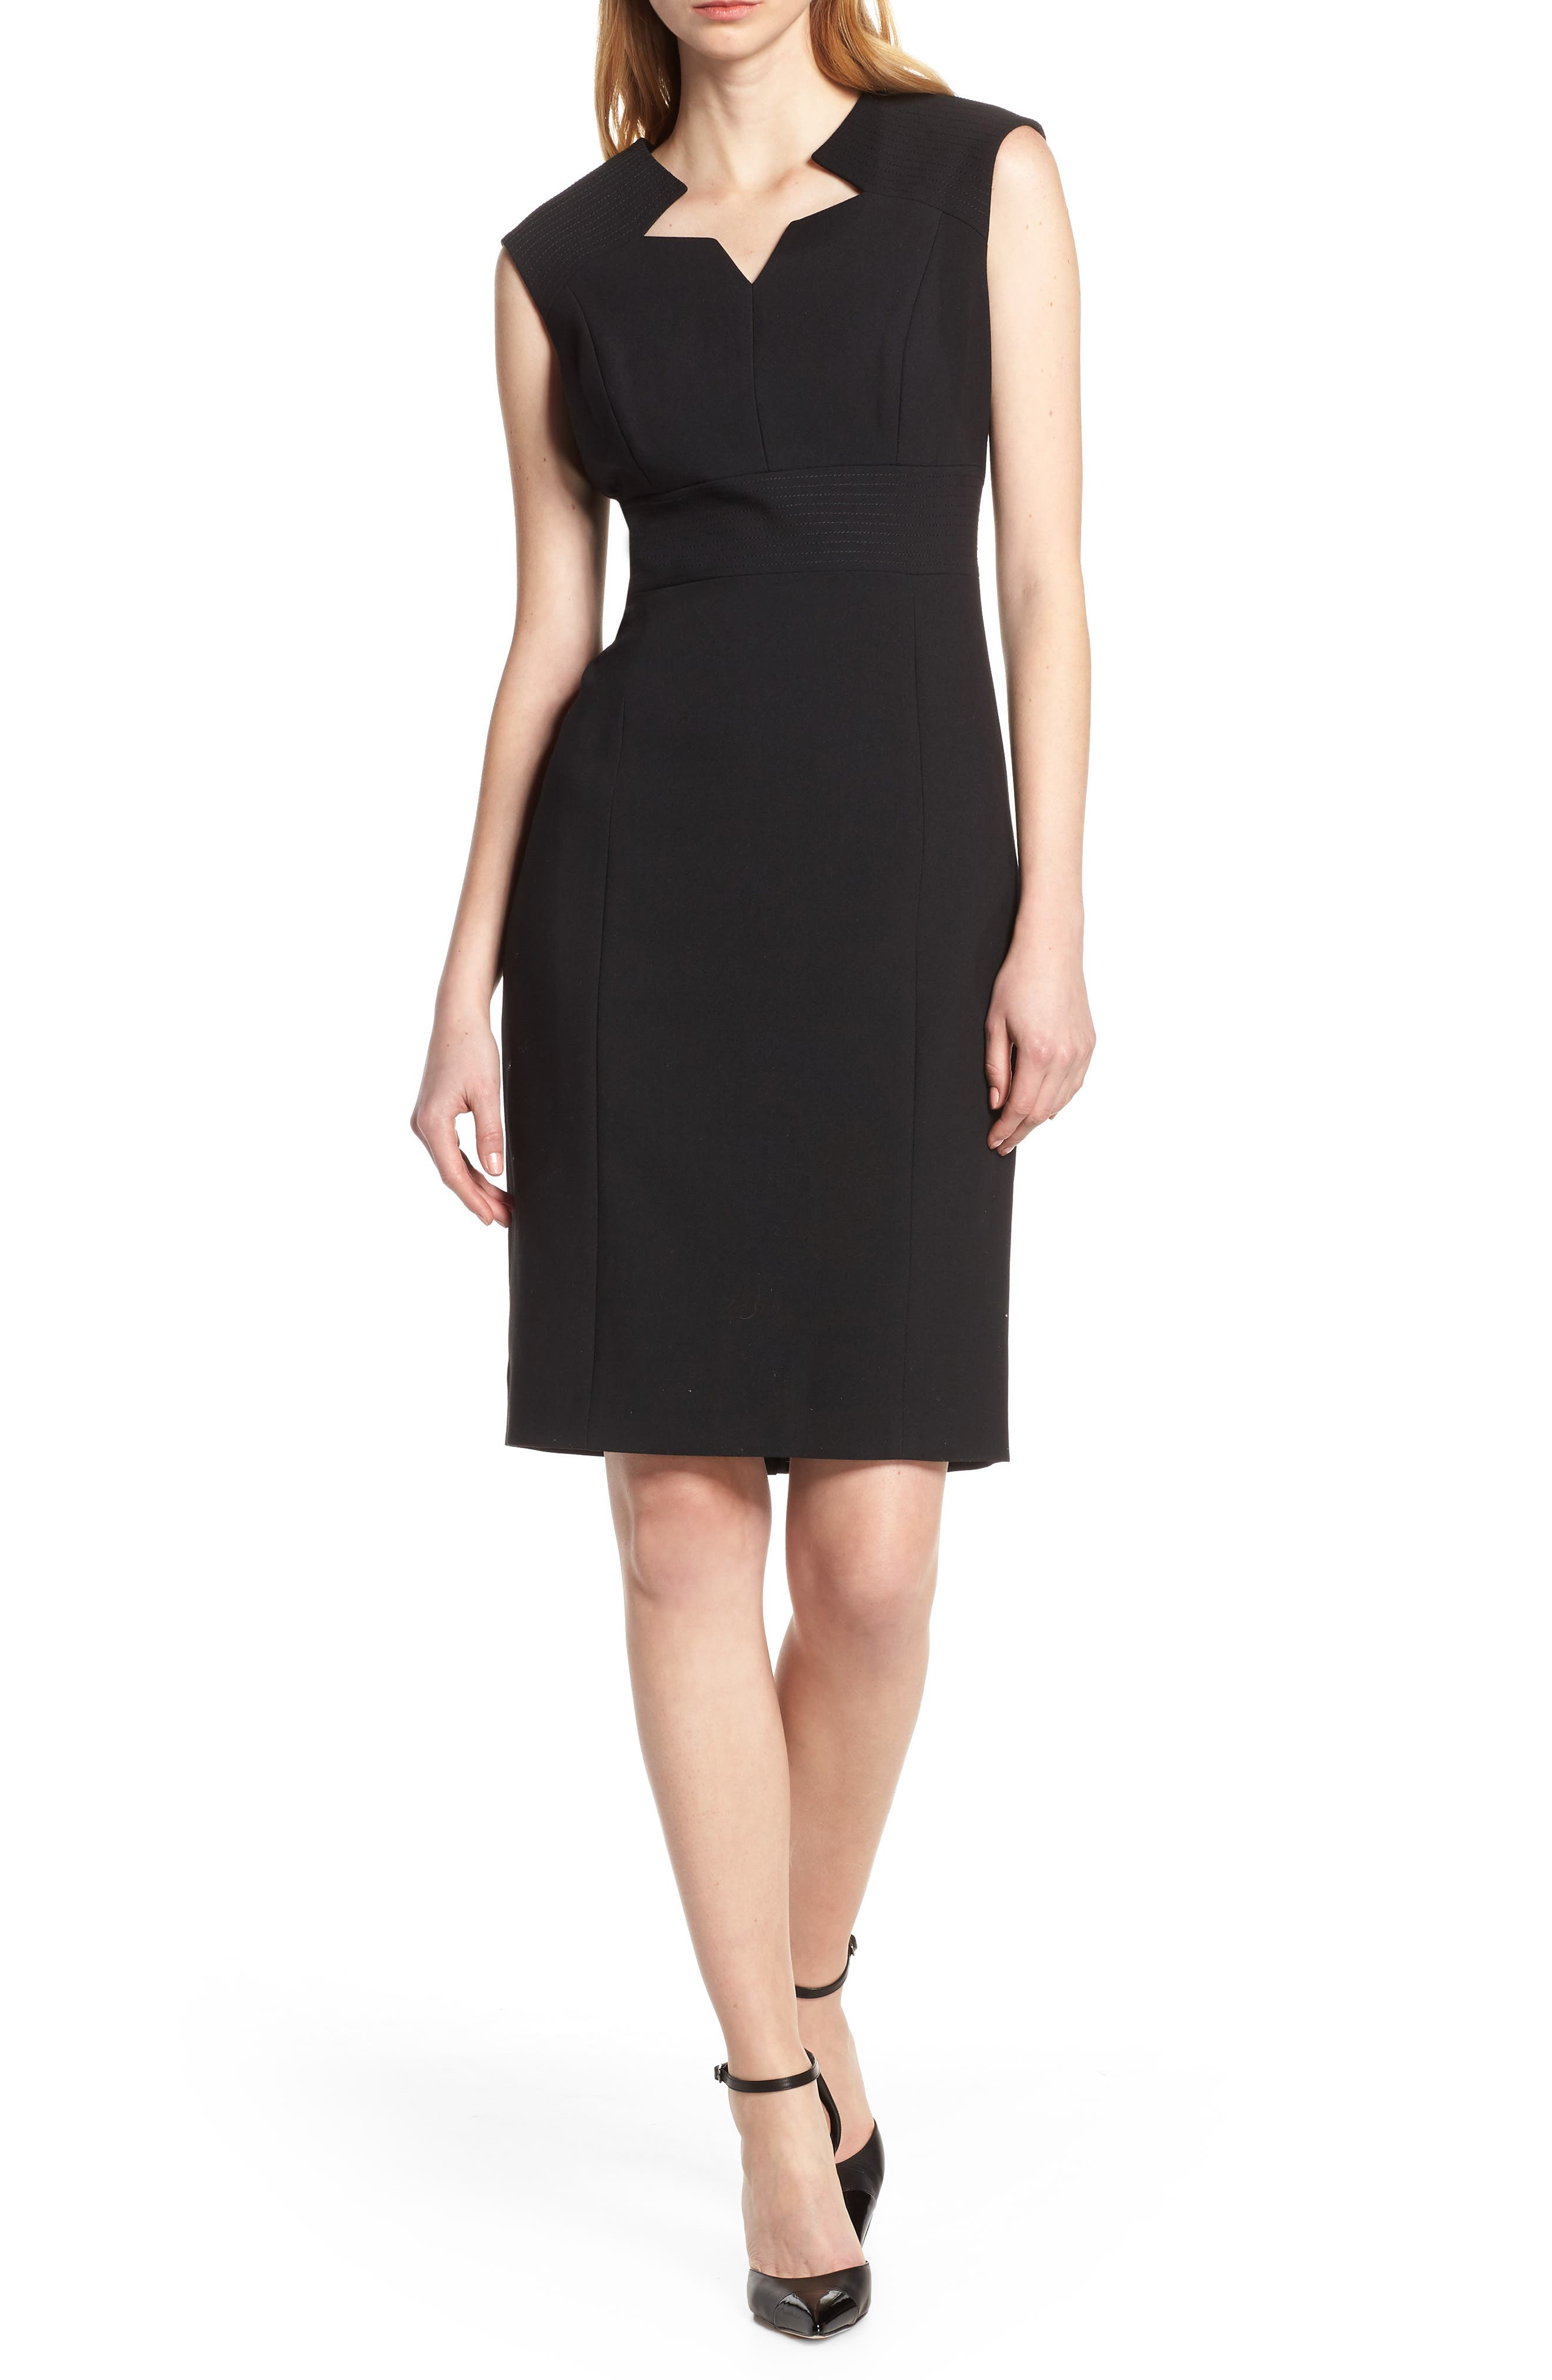 TAHARI,                             Star Neckline Crepe Sheath Dress,                             Main thumbnail 1, color,                             BLACK